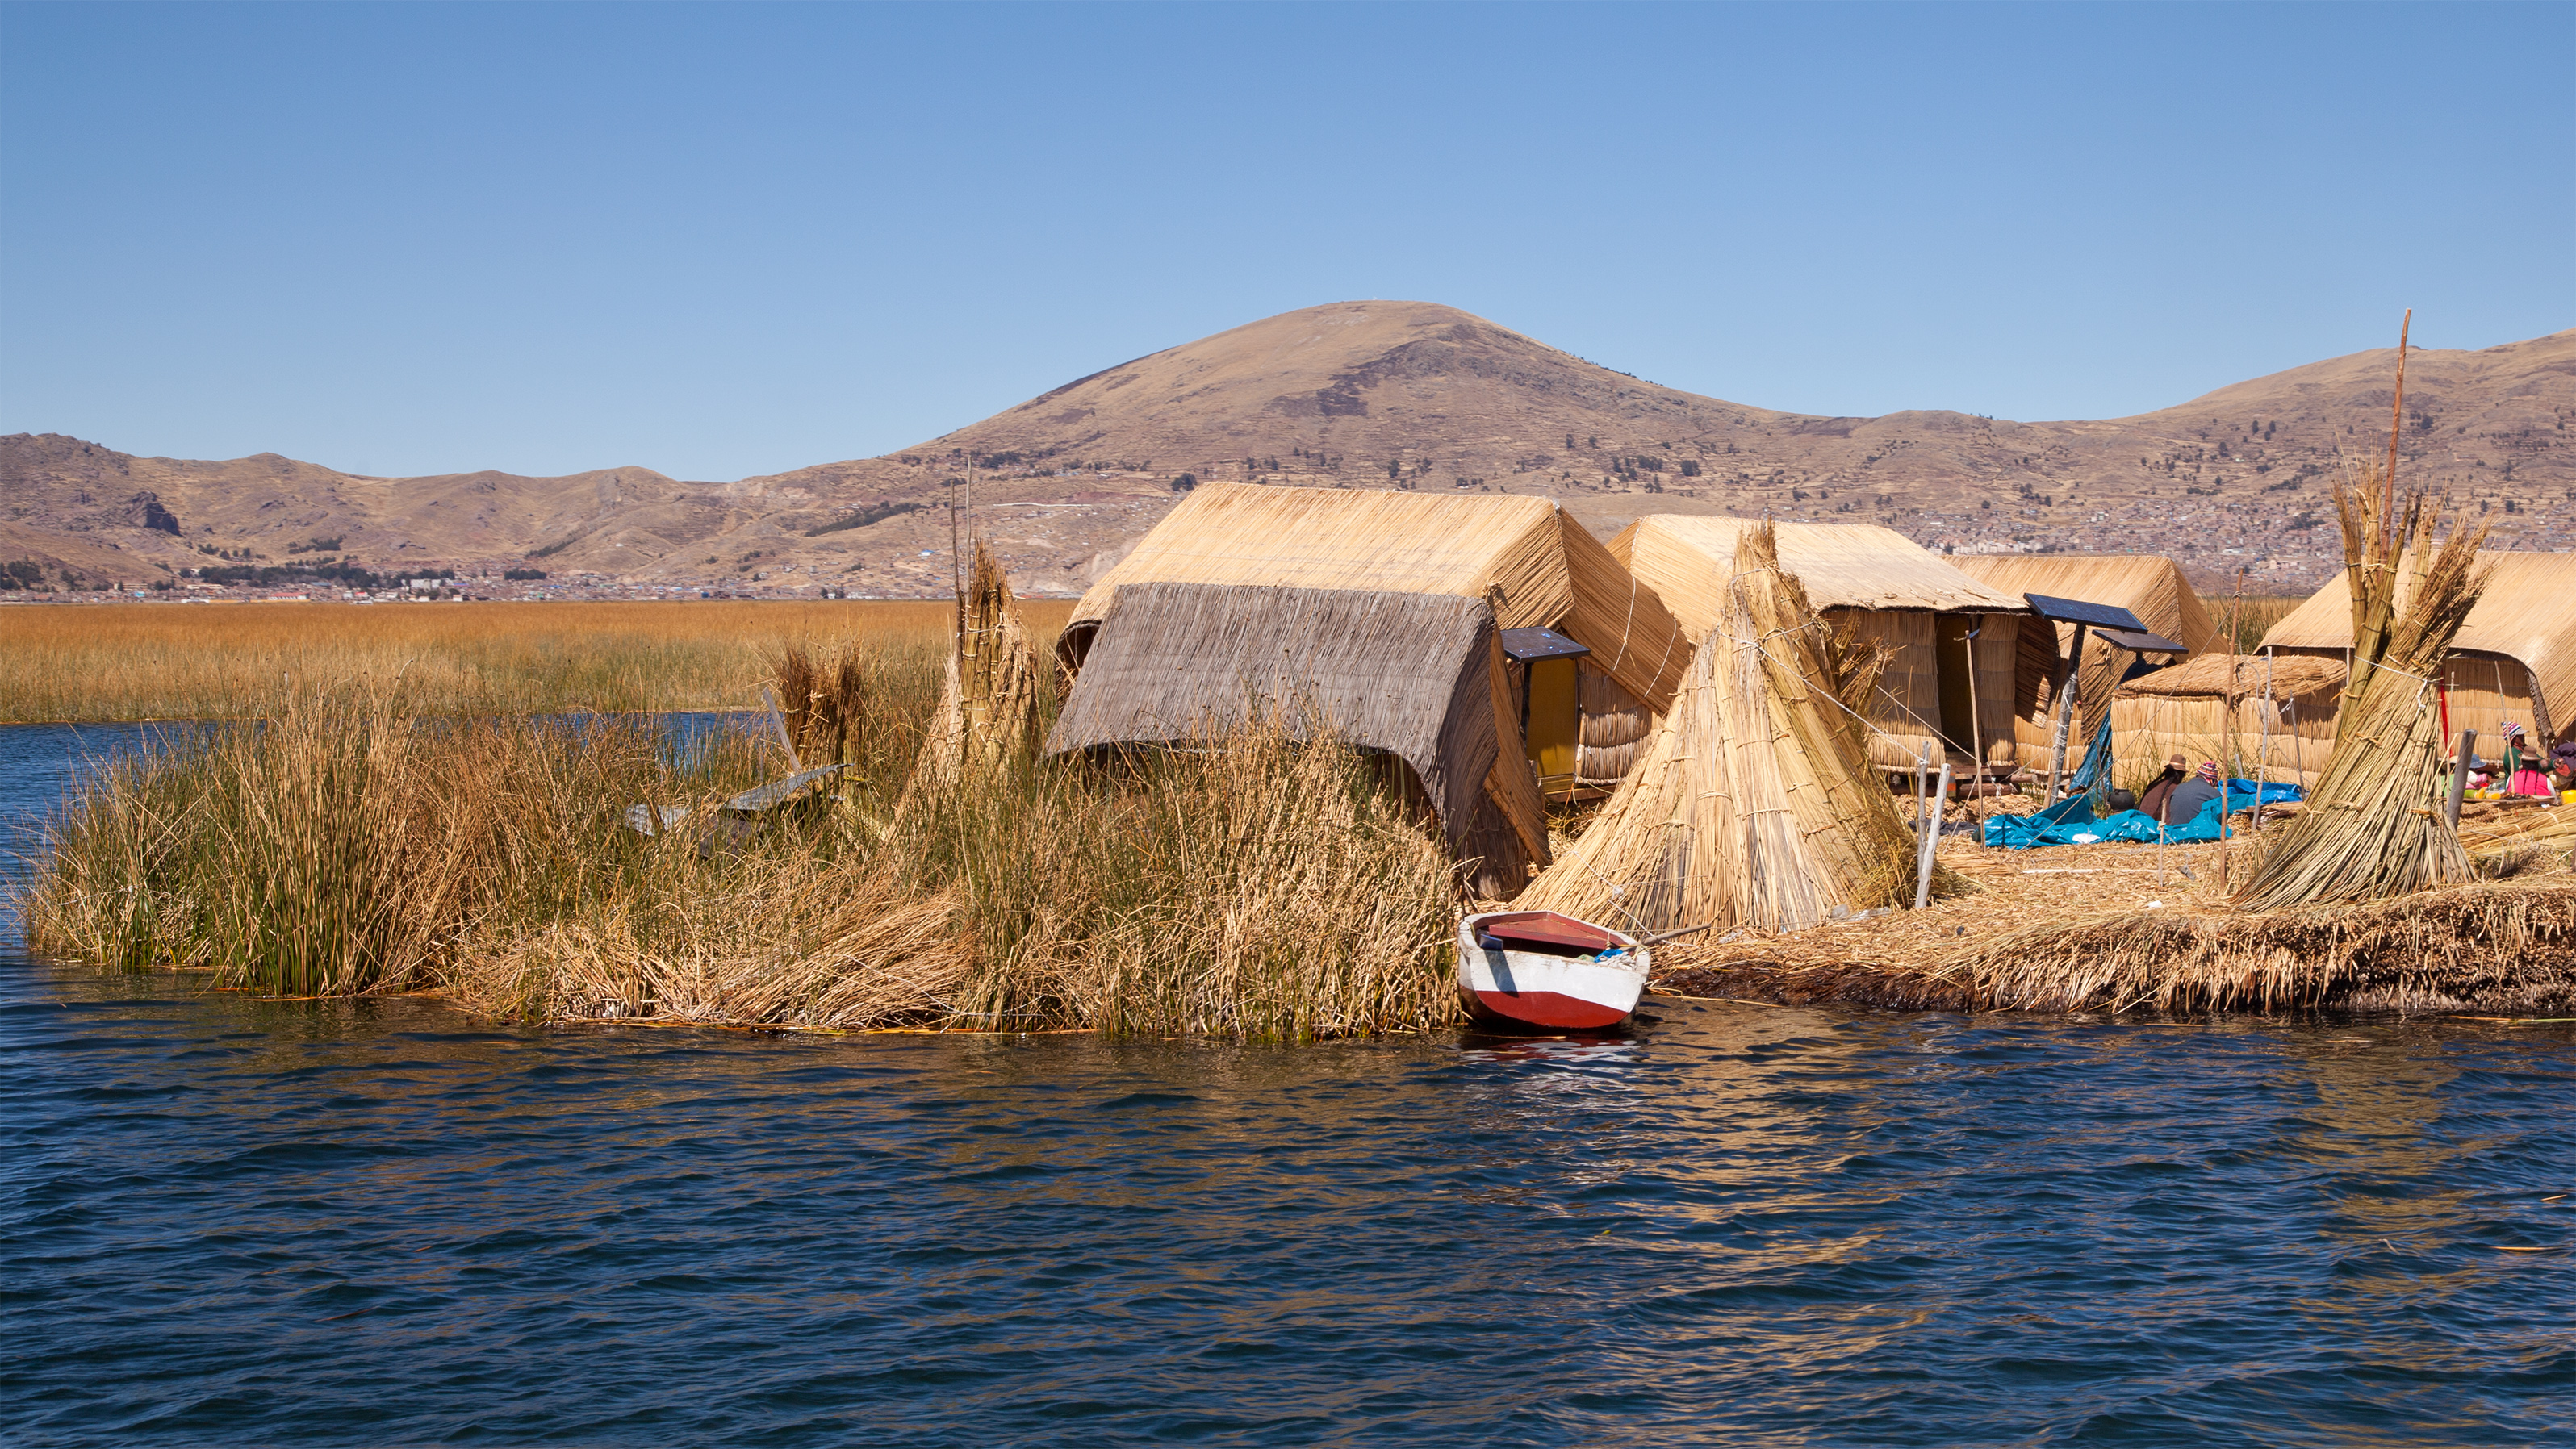 File:Peru Lago Titicaca Islas Flotantes.jpg - Wikimedia Commons